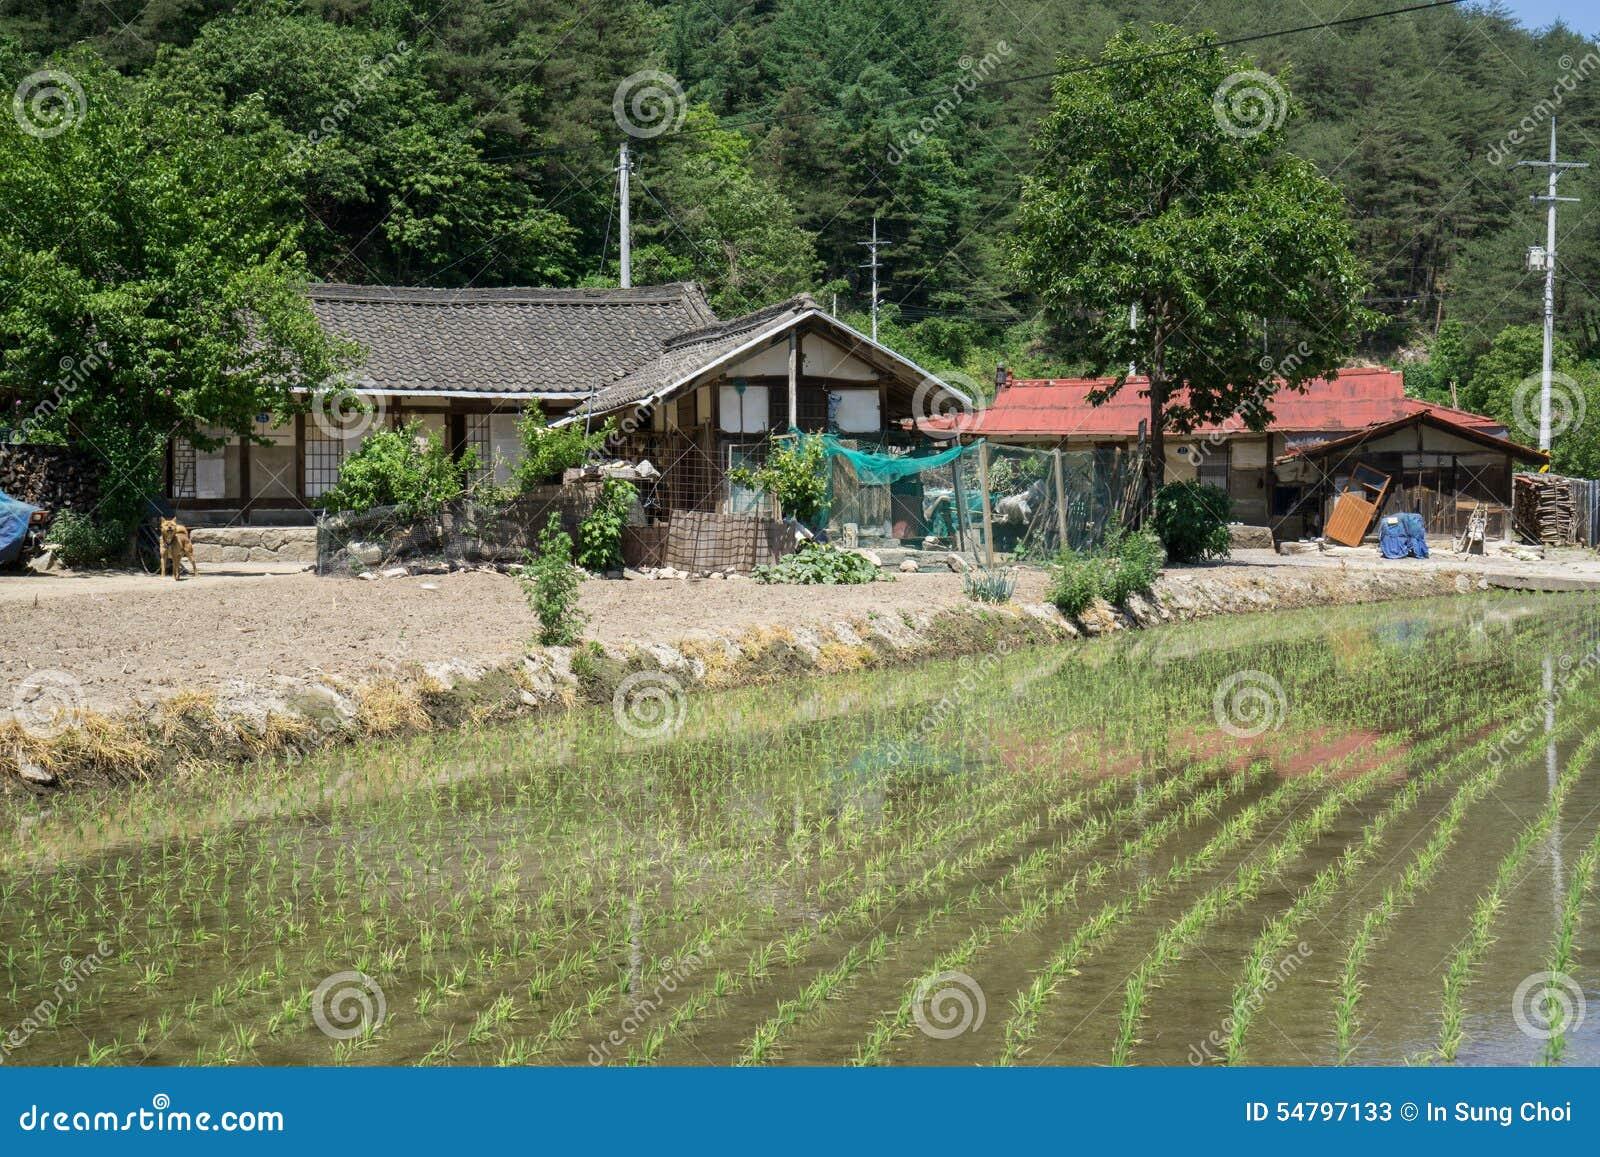 Country farmhouse stock photo image 54797133 for Small house design korean